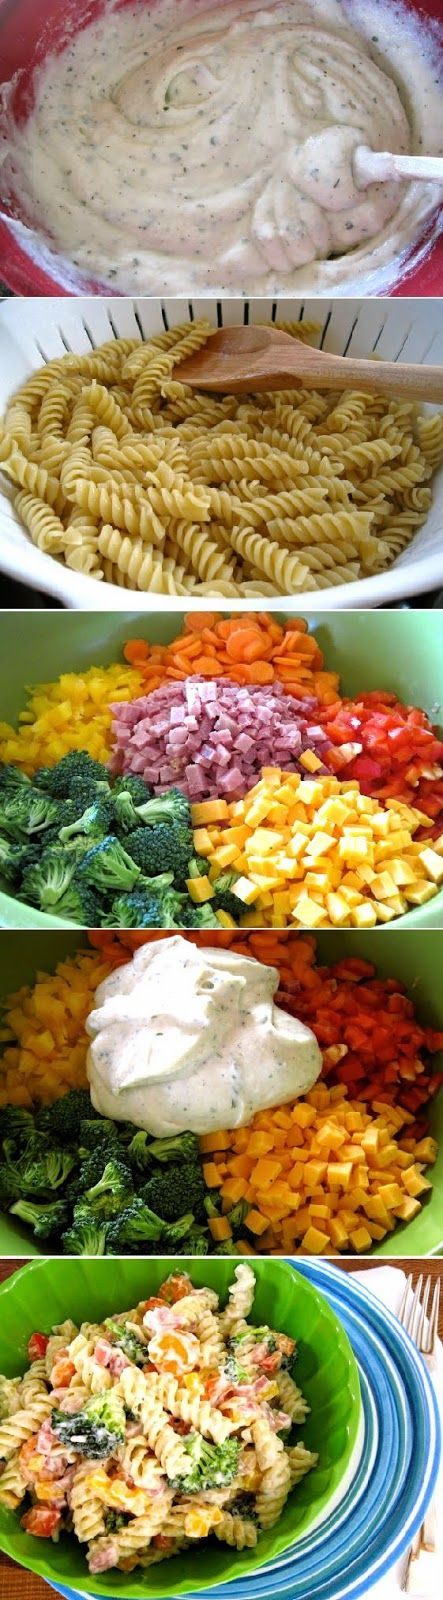 Food & Drink: Pasta Salad colored